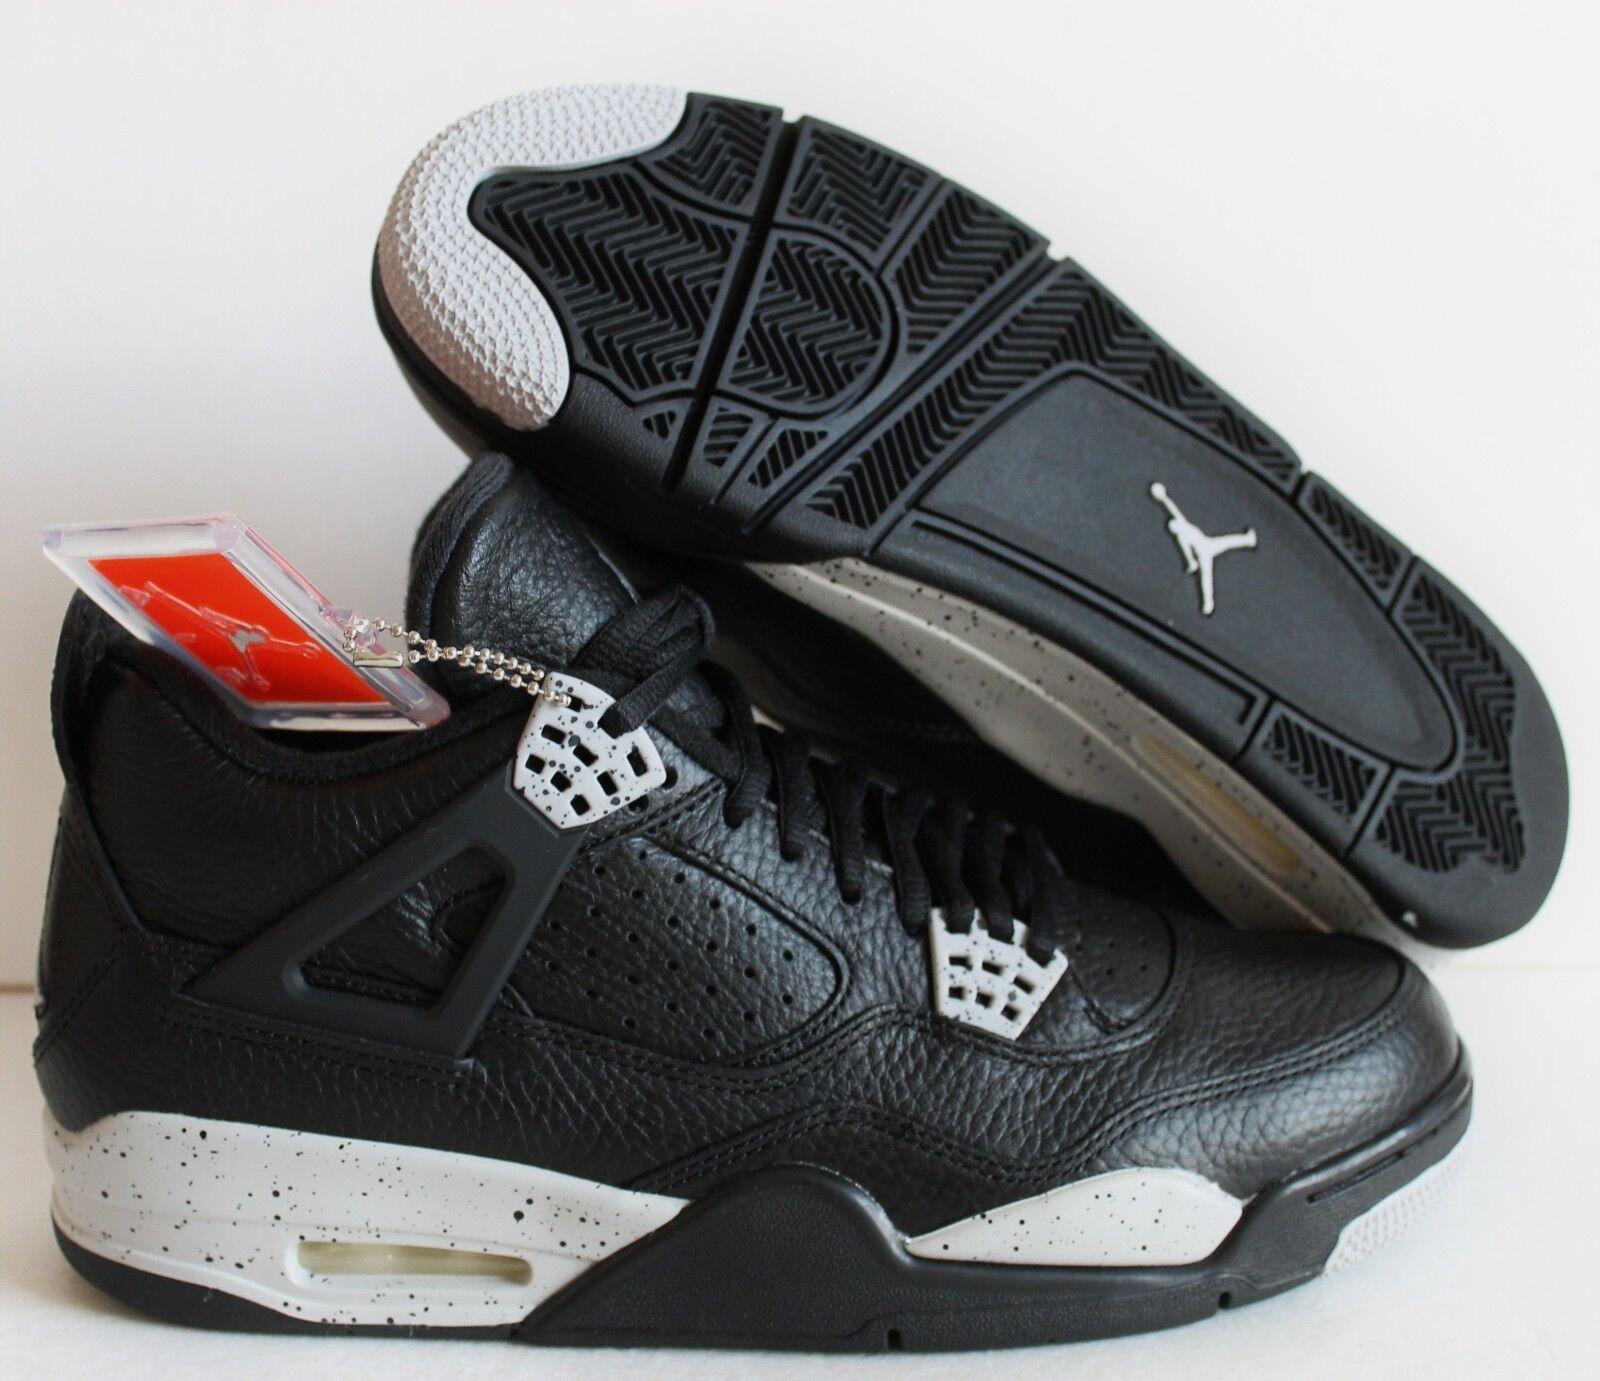 Nike air jordan 4 retro ist schwarz-tech Grau-schwarz sz 16 keks![314254-003]